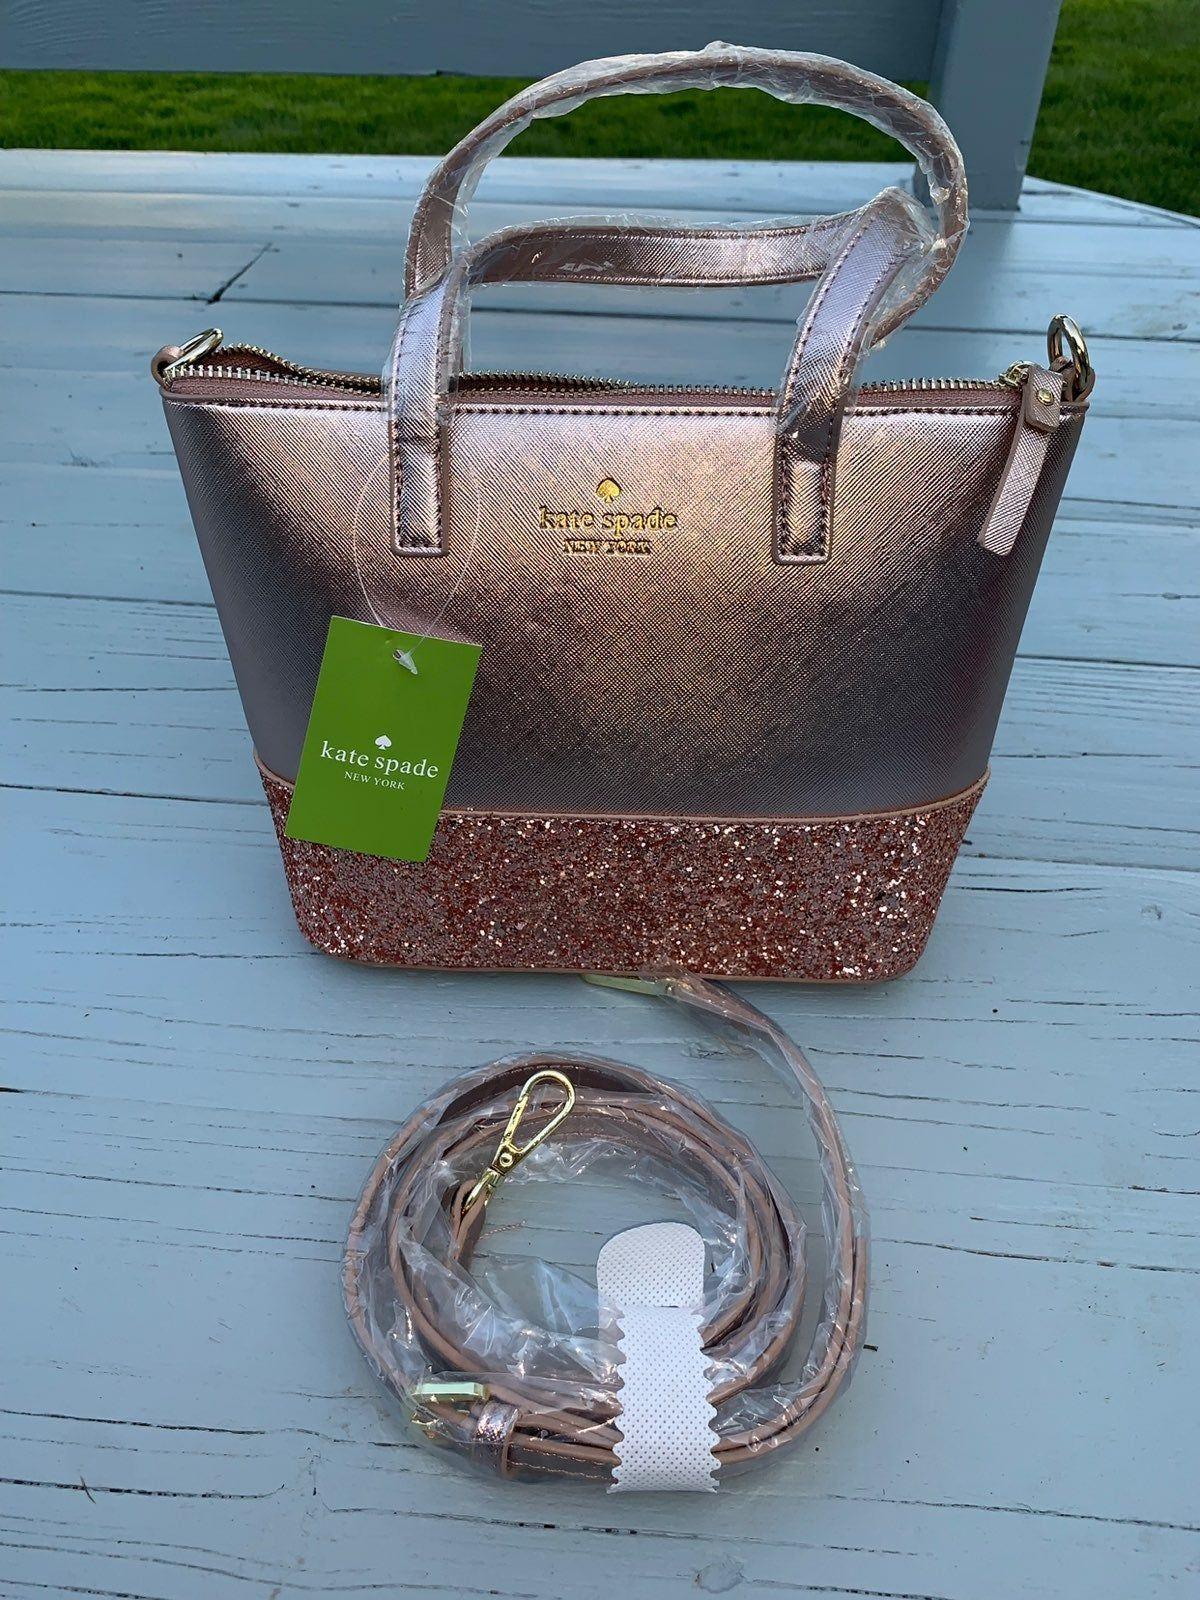 Pin on Kate Spade Crossbody Bags